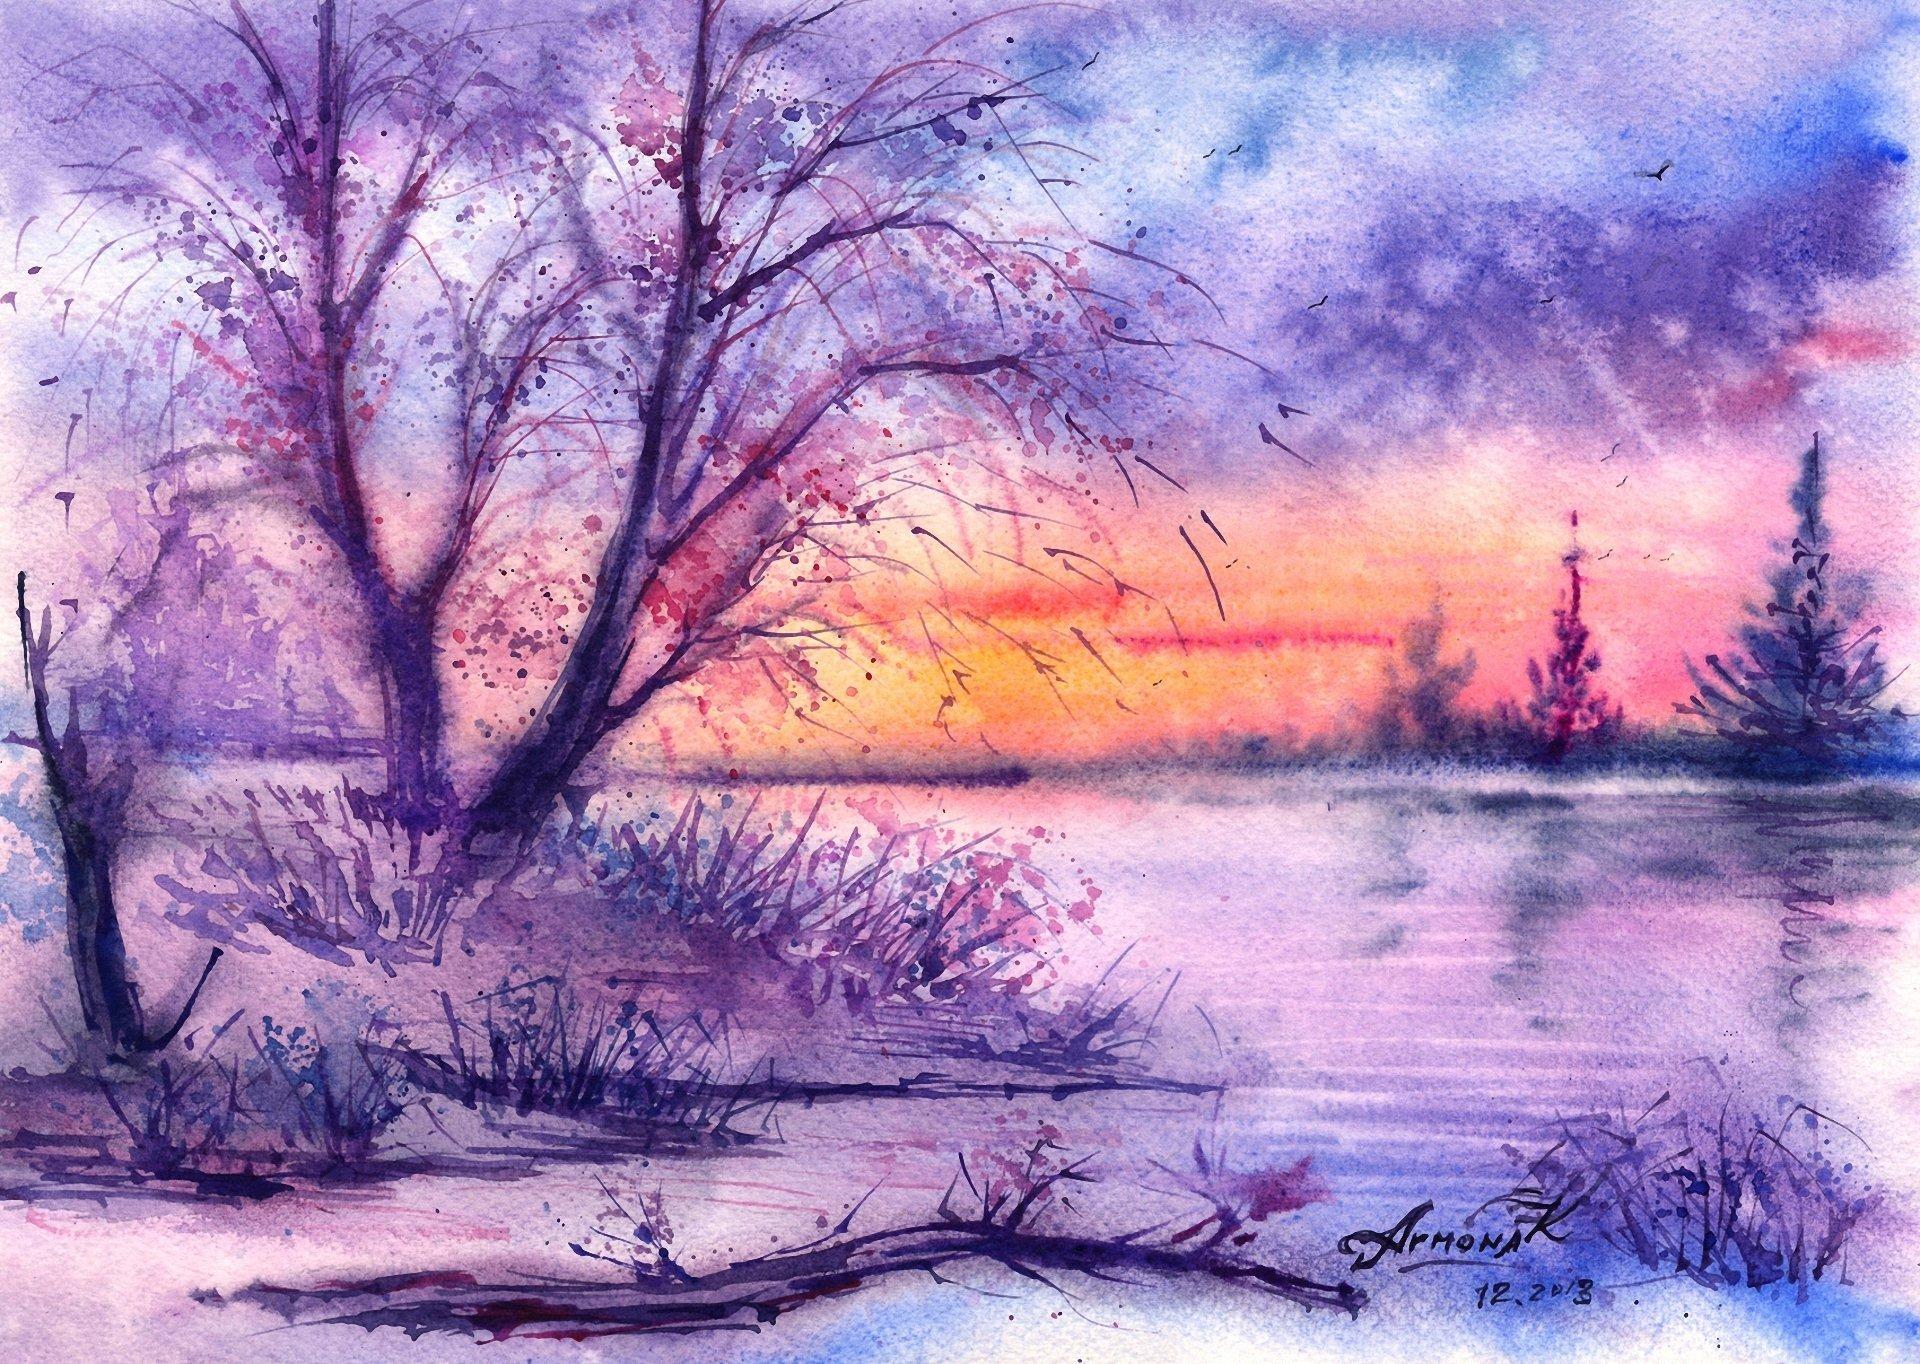 1920x1364 Painted Landscape Watercolor Tree River Winter Birds Hd Wallpaper